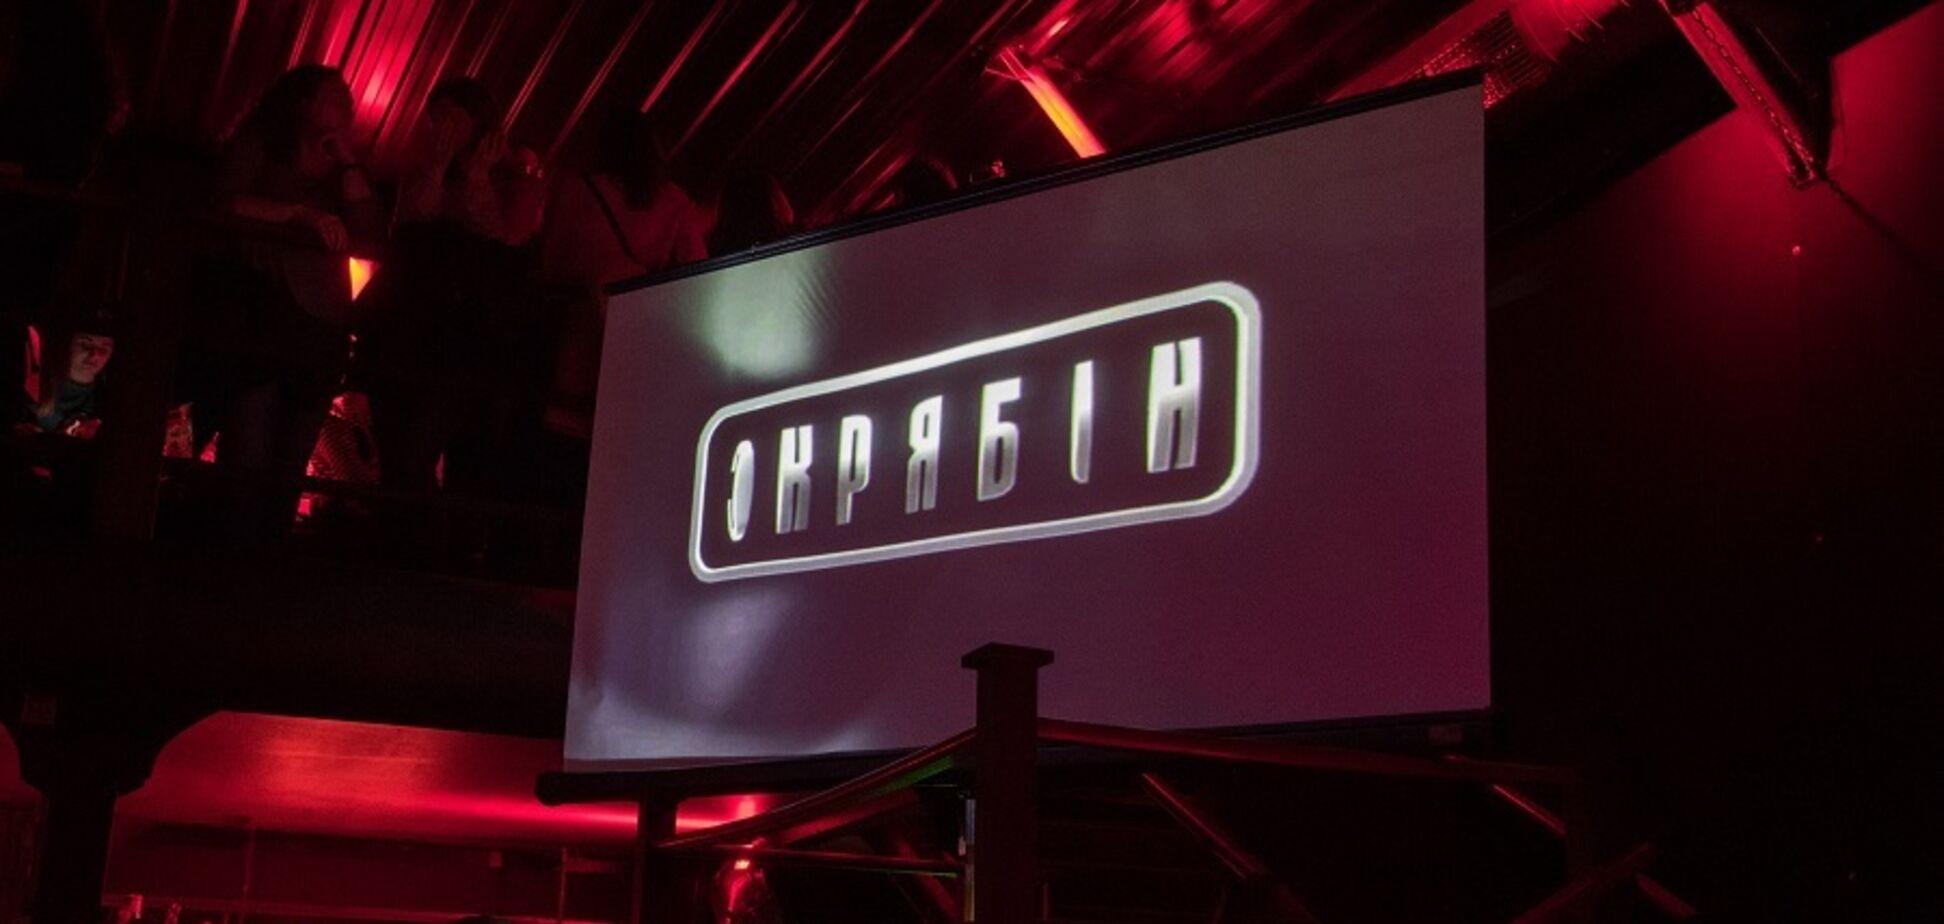 'Музыка Кузьмы жива': как 'Скрябин' зажег на концерте в Мюнхене